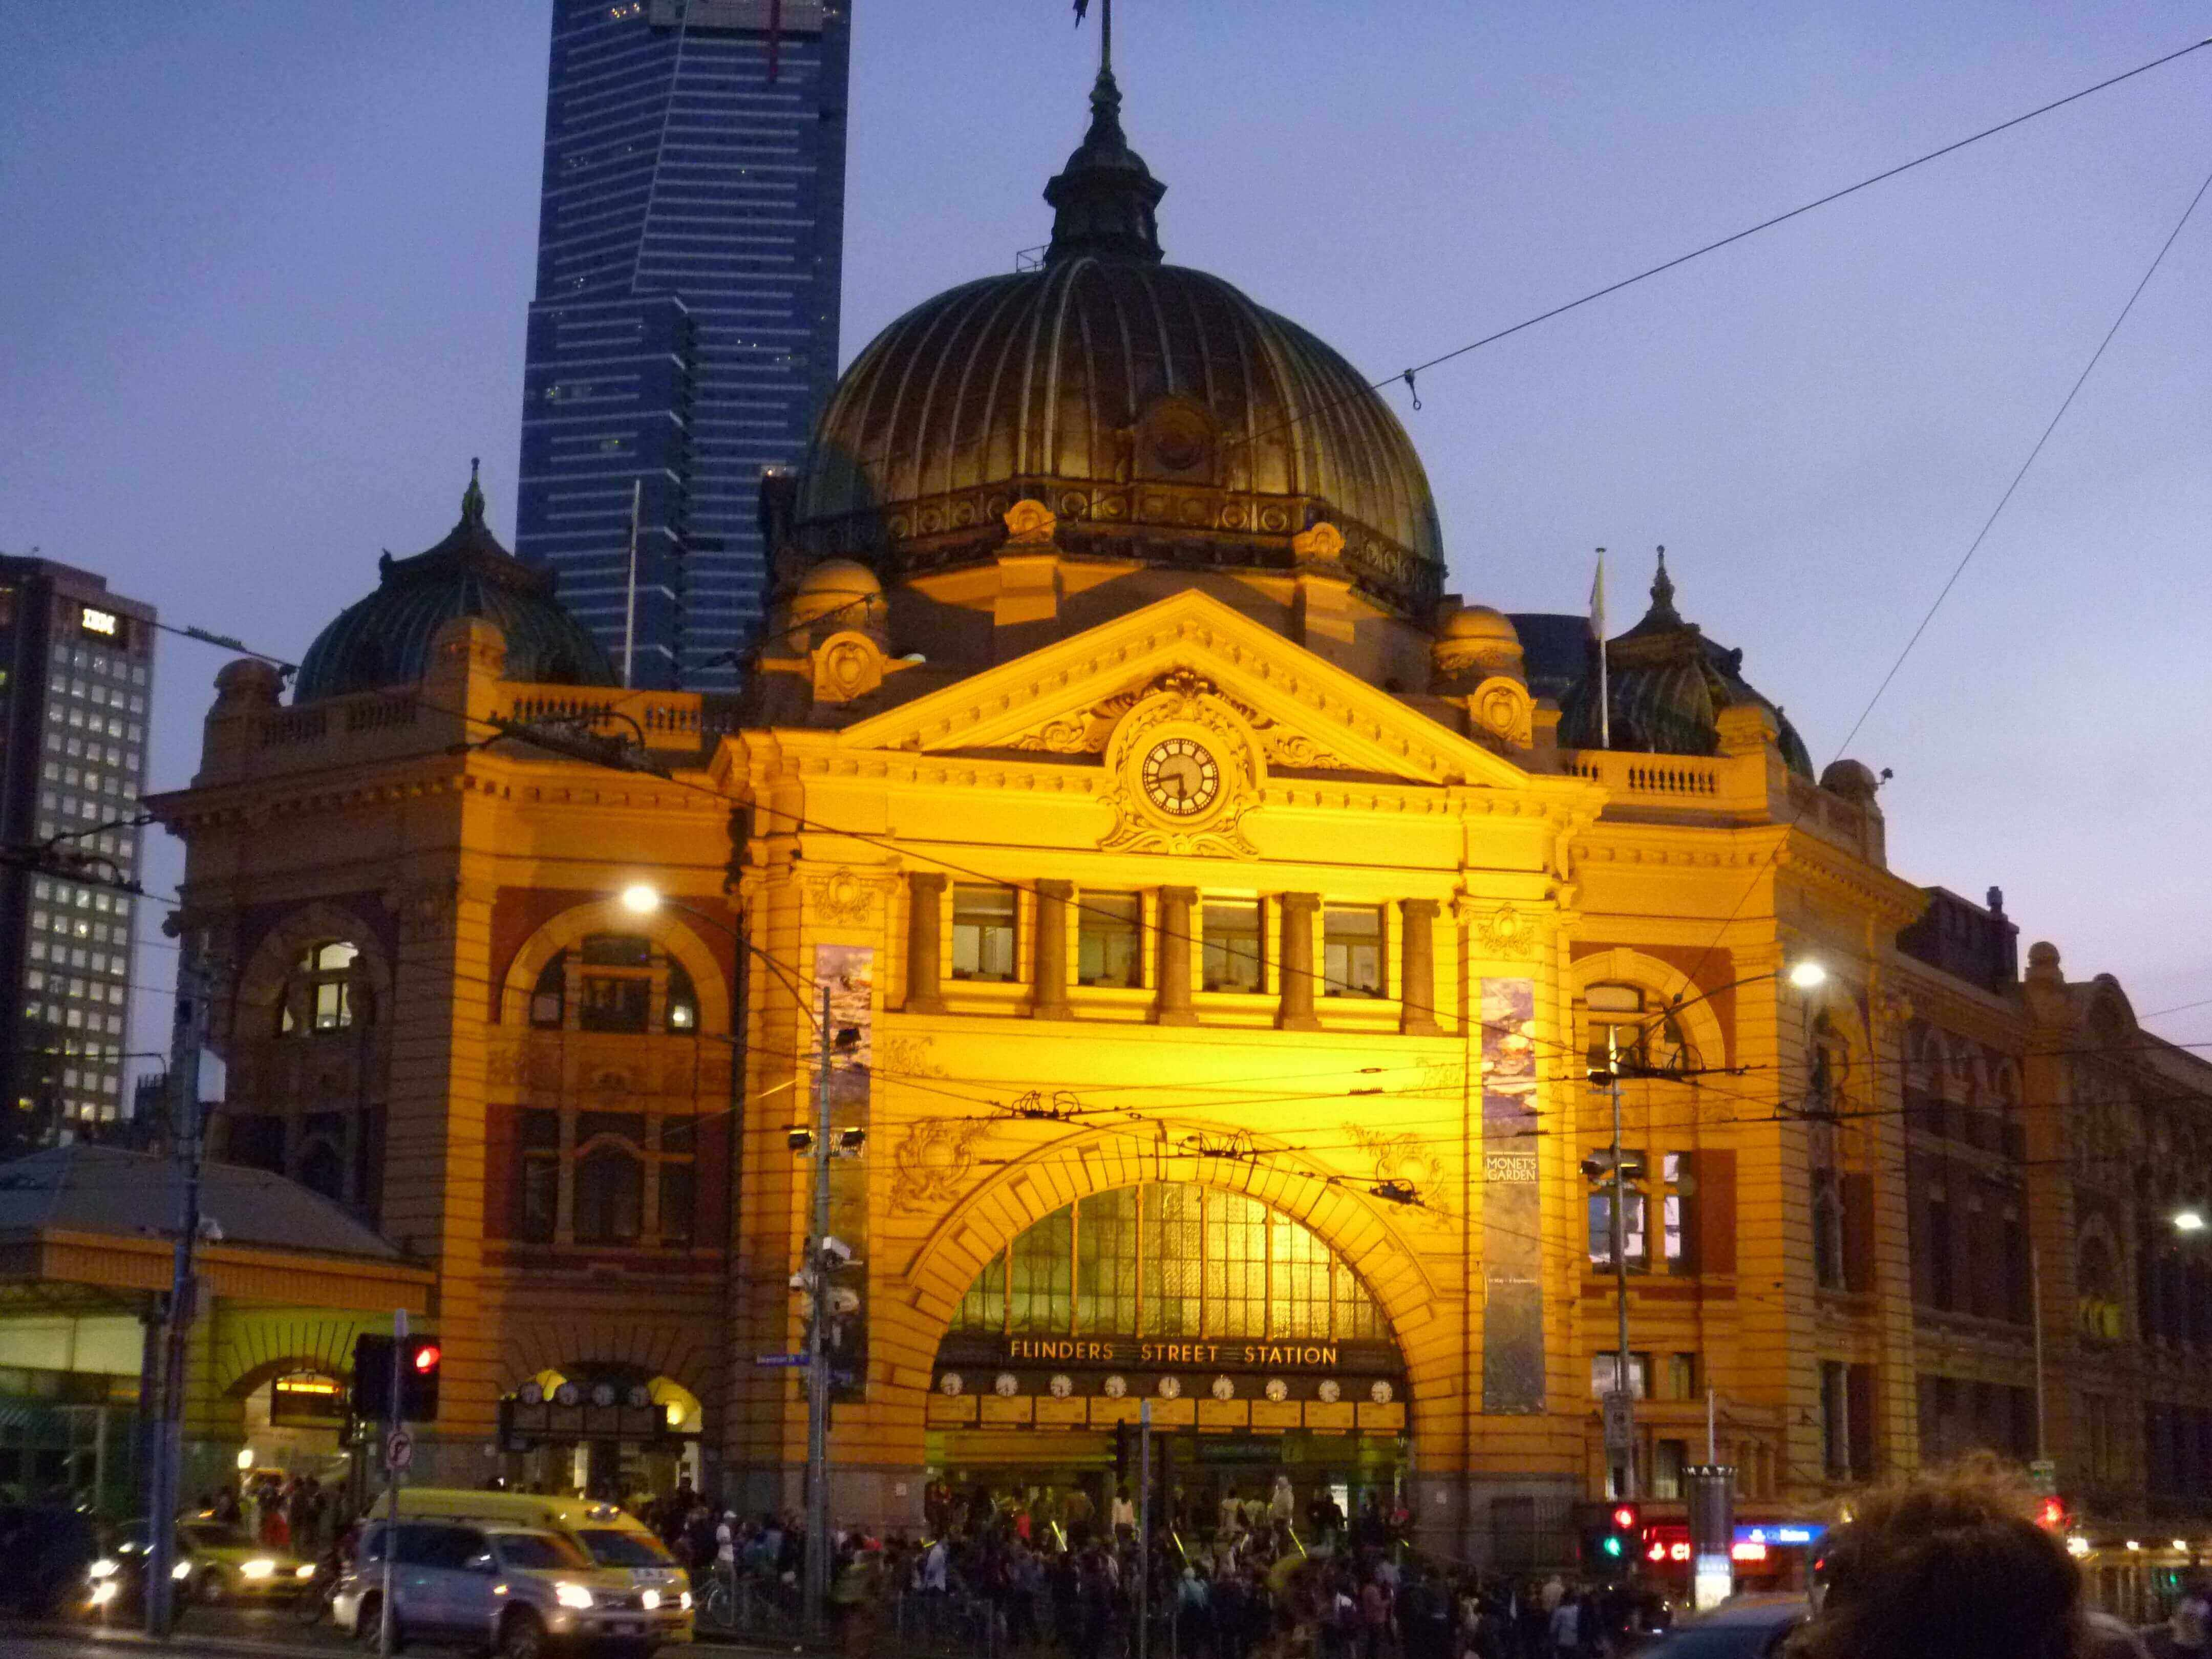 Station Metro - Melbourne - Australie